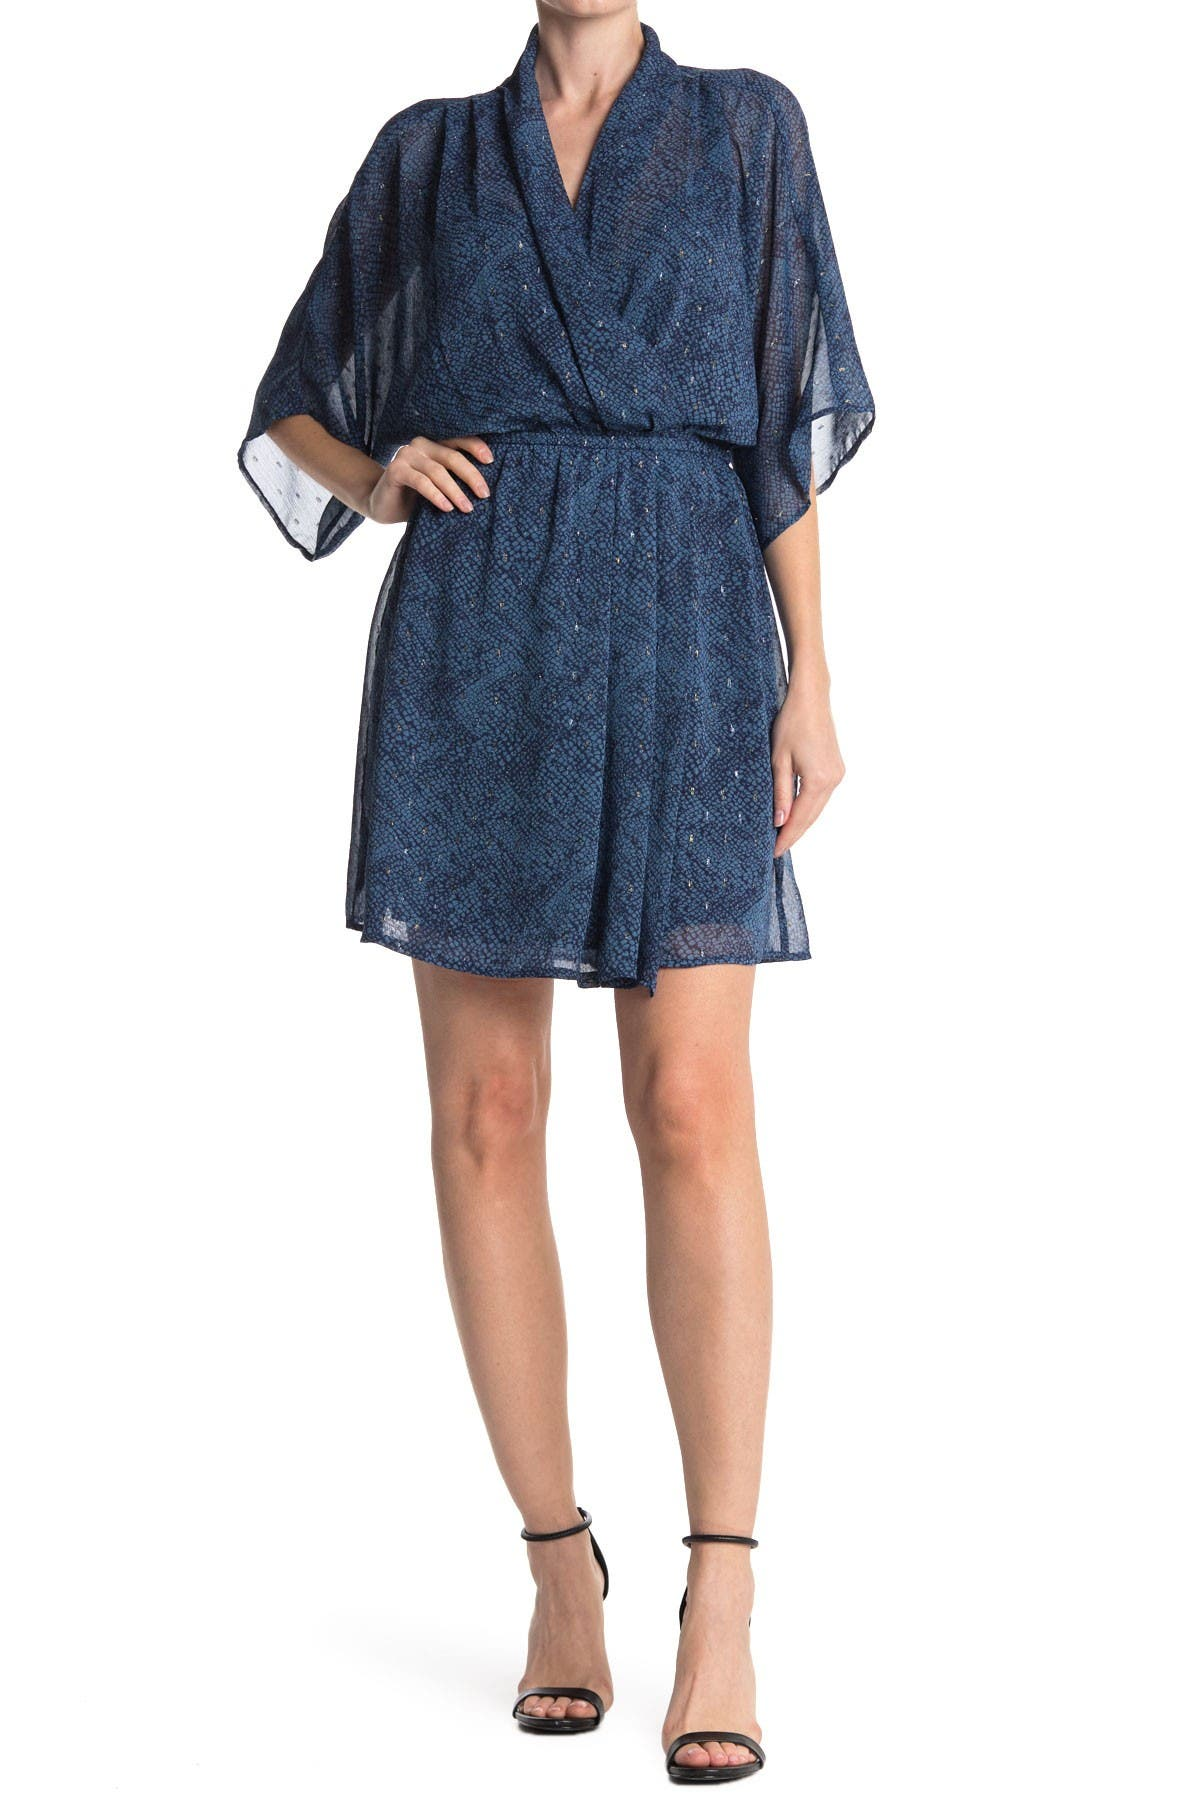 Image of Love Stitch Short Sleeve V-Neck Elastic Waist Dress